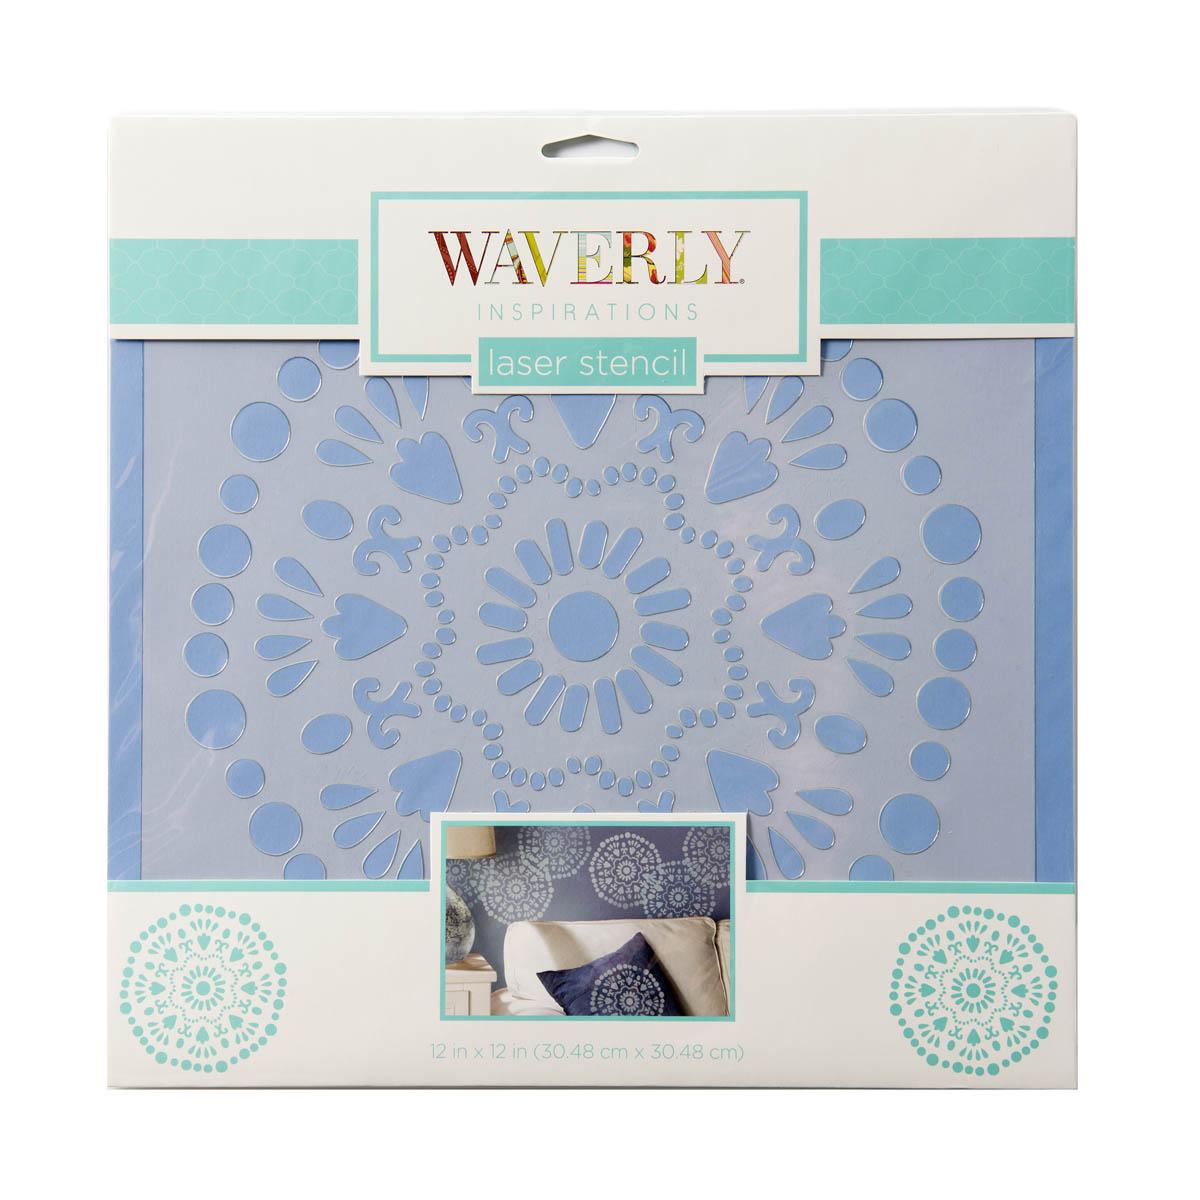 Waverly ® Inspirations Laser Stencils - Décor - Big Wheel, 12